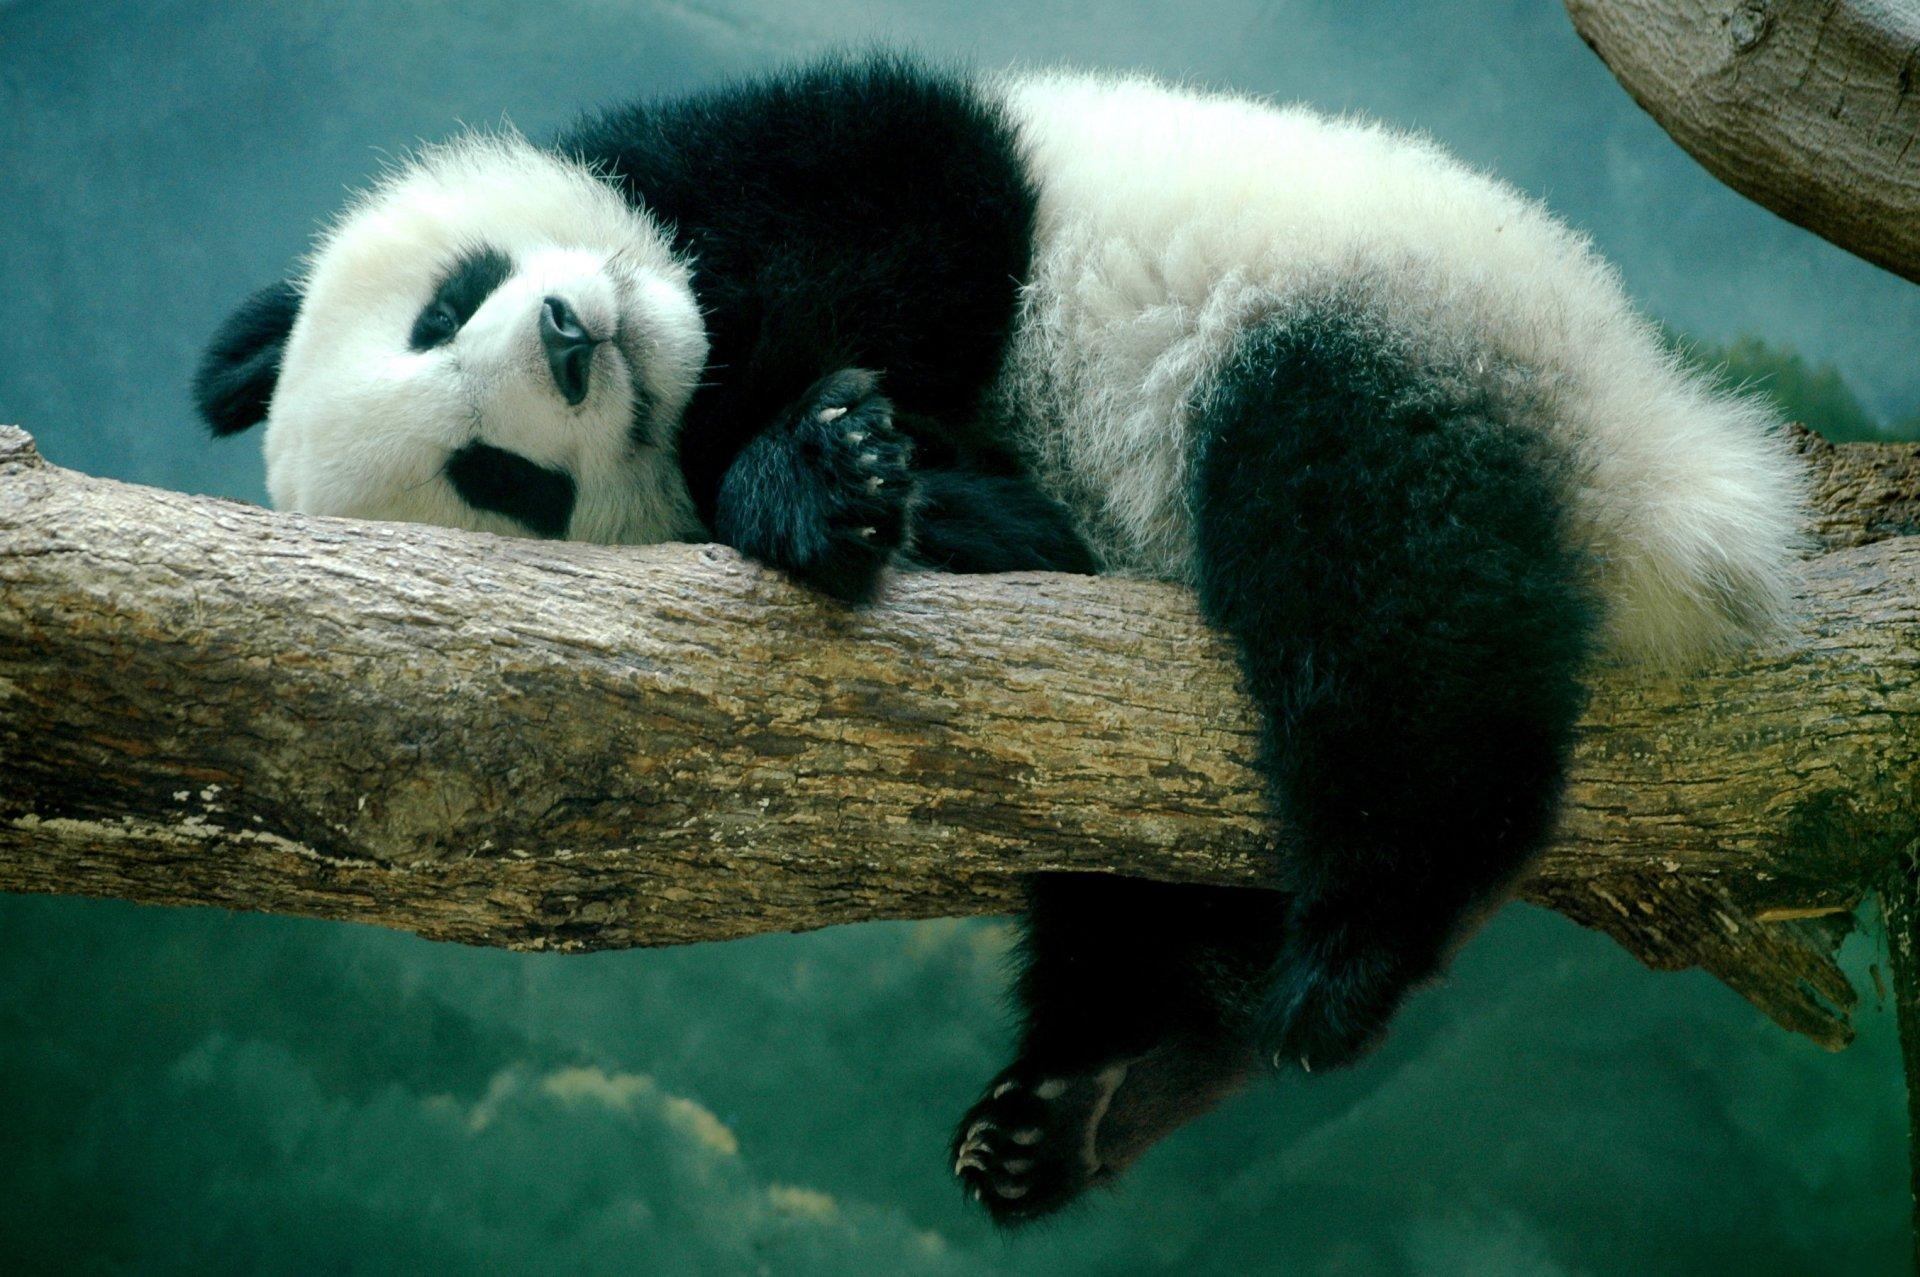 Panda Full HD Fond d'écran and Arrière-Plan   2707x1800   ID:588525